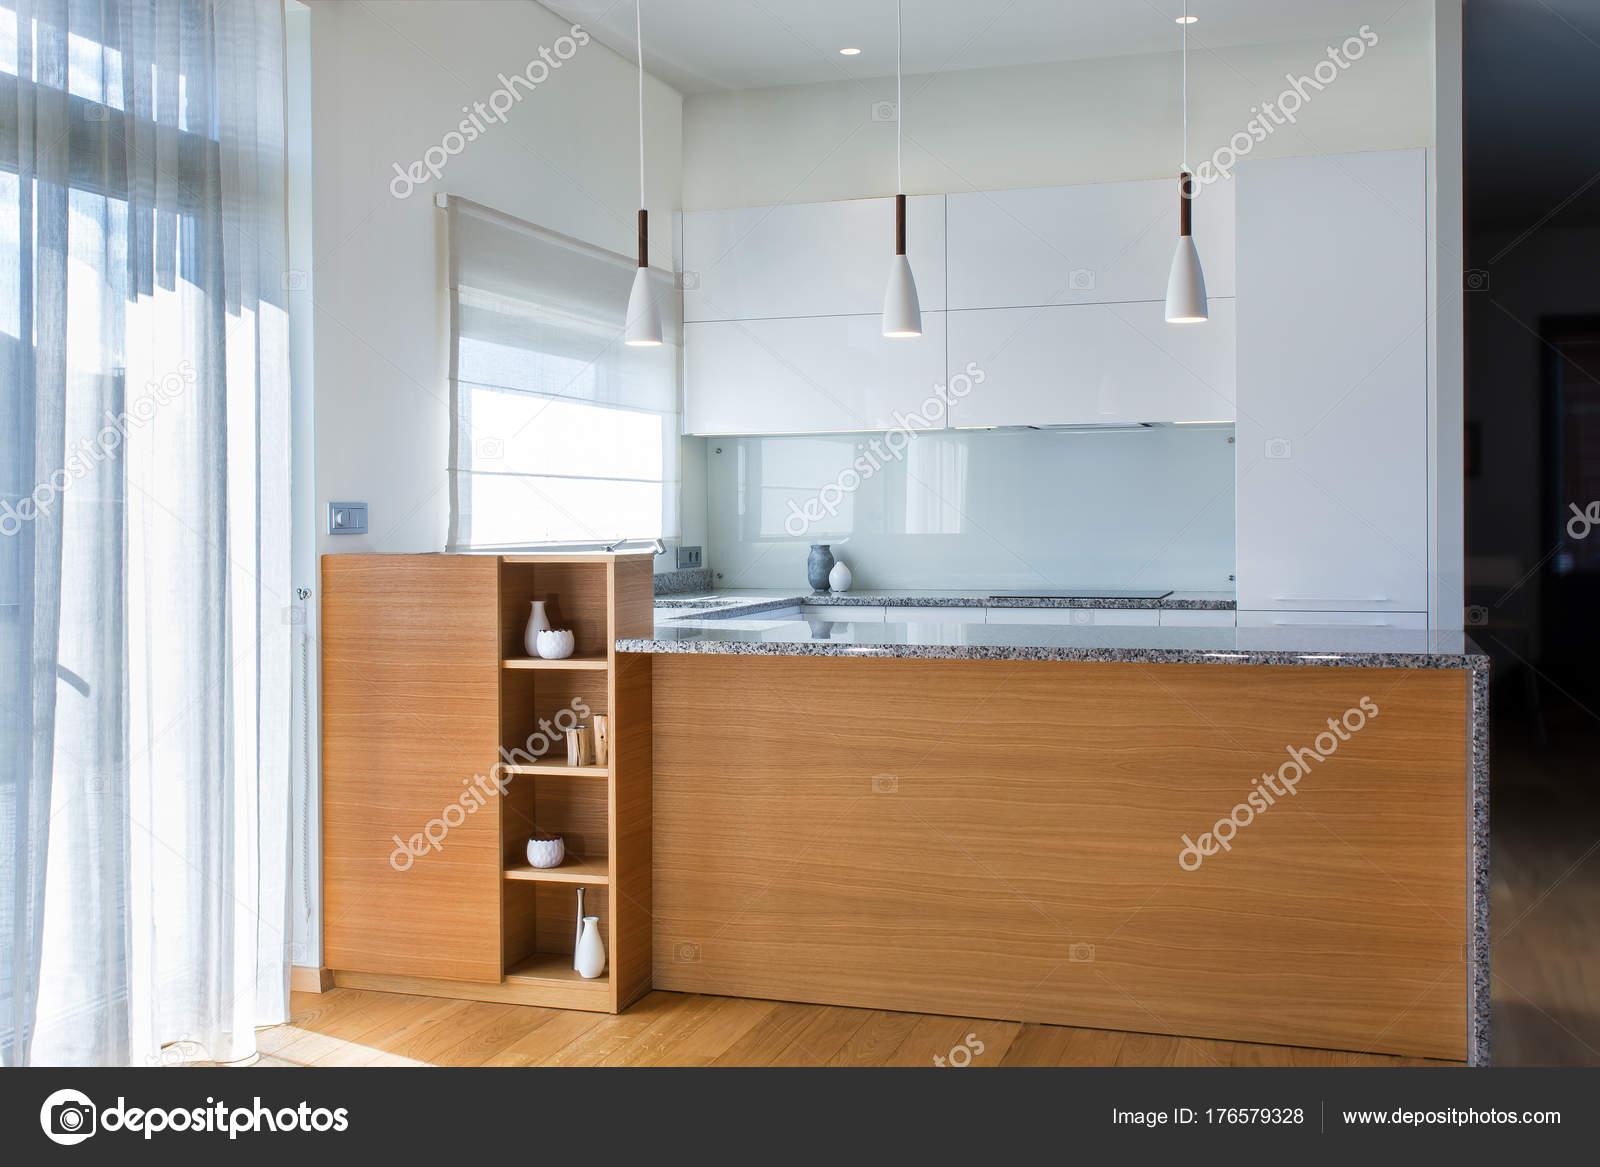 Moderno Diseño Muebles Cocina Interior Claro Con Detalles ...